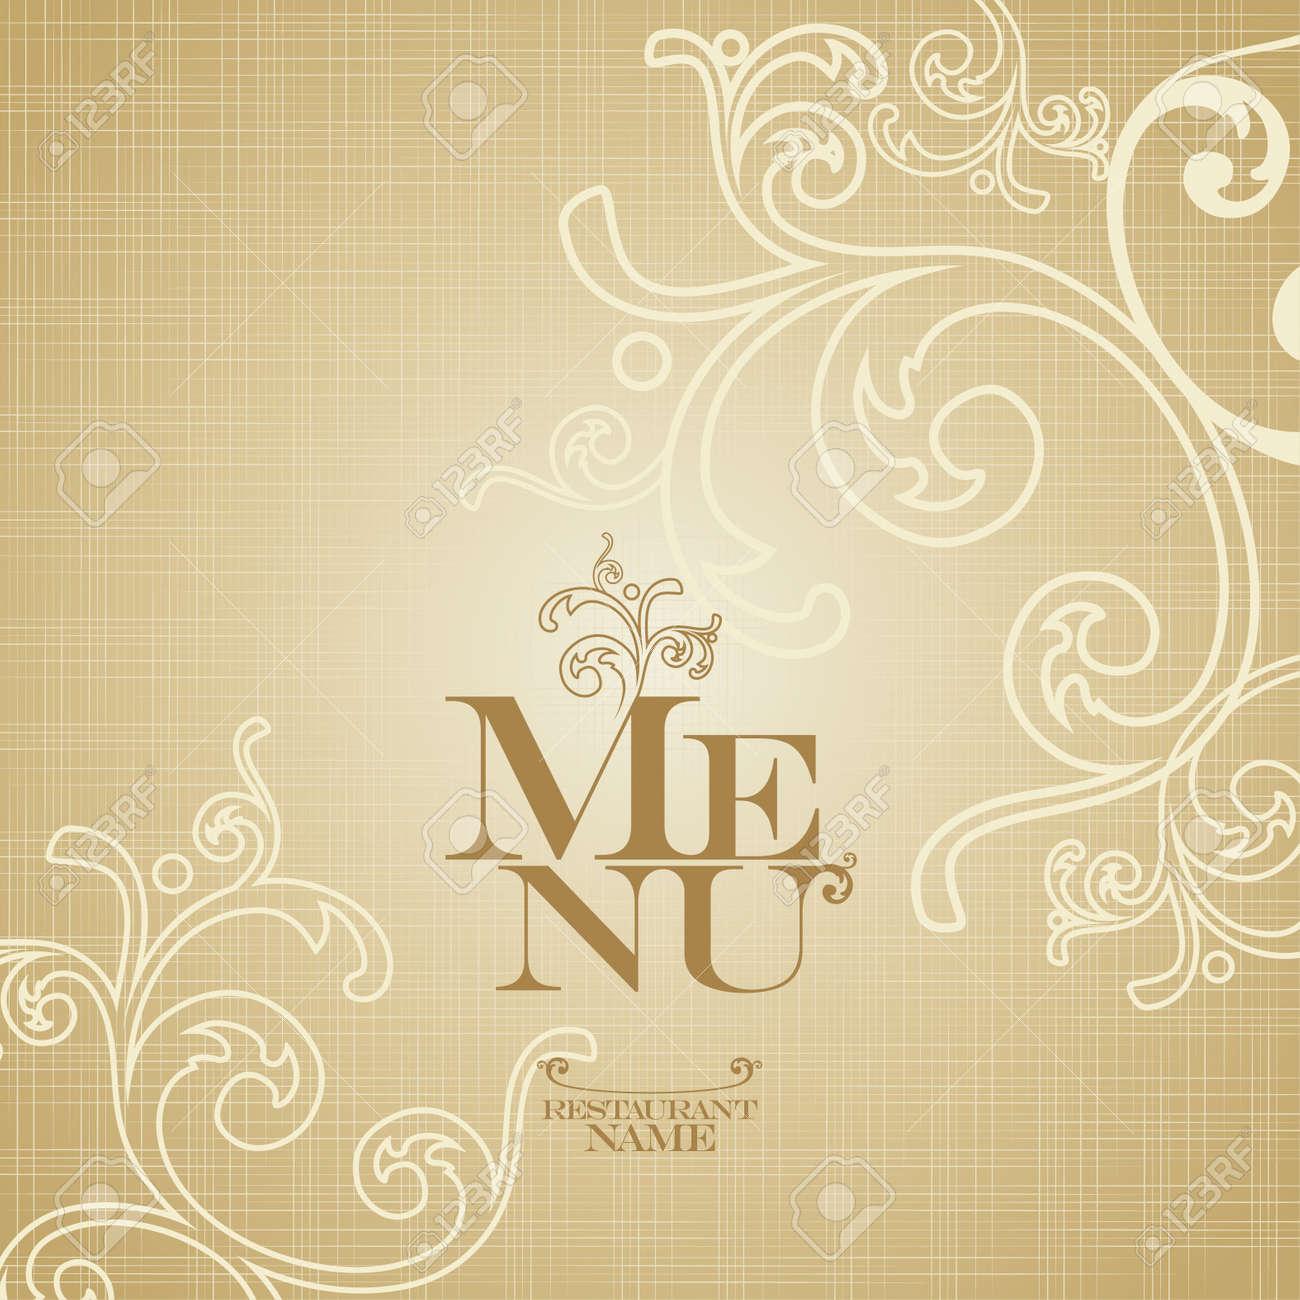 restaurant menu card design template. royalty free cliparts, vectors